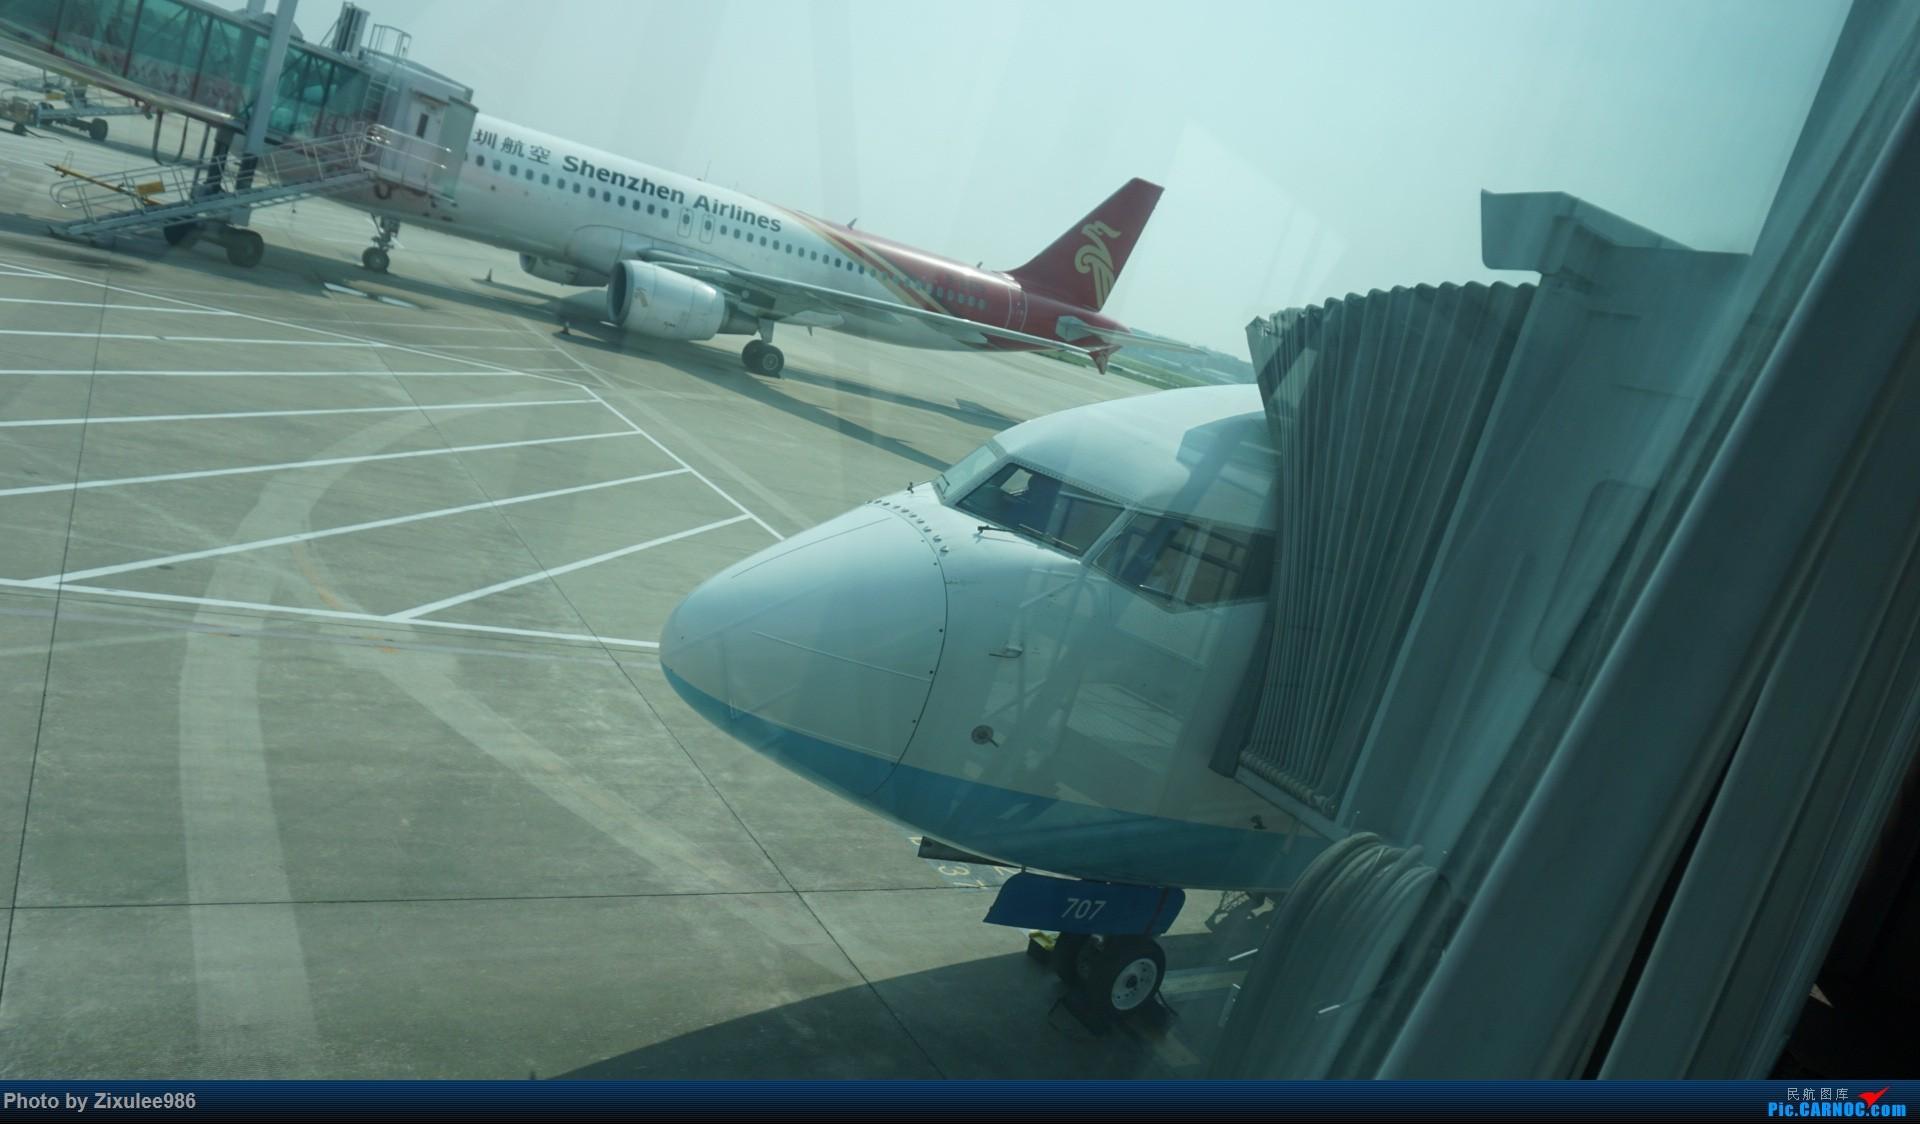 Re:[原创]加拿大21日游学之旅(一)~JJN-PVG-YYZ..第一次发游记~缓更请谅解 BOEING 737-800 B-5707 中国泉州晋江国际机场